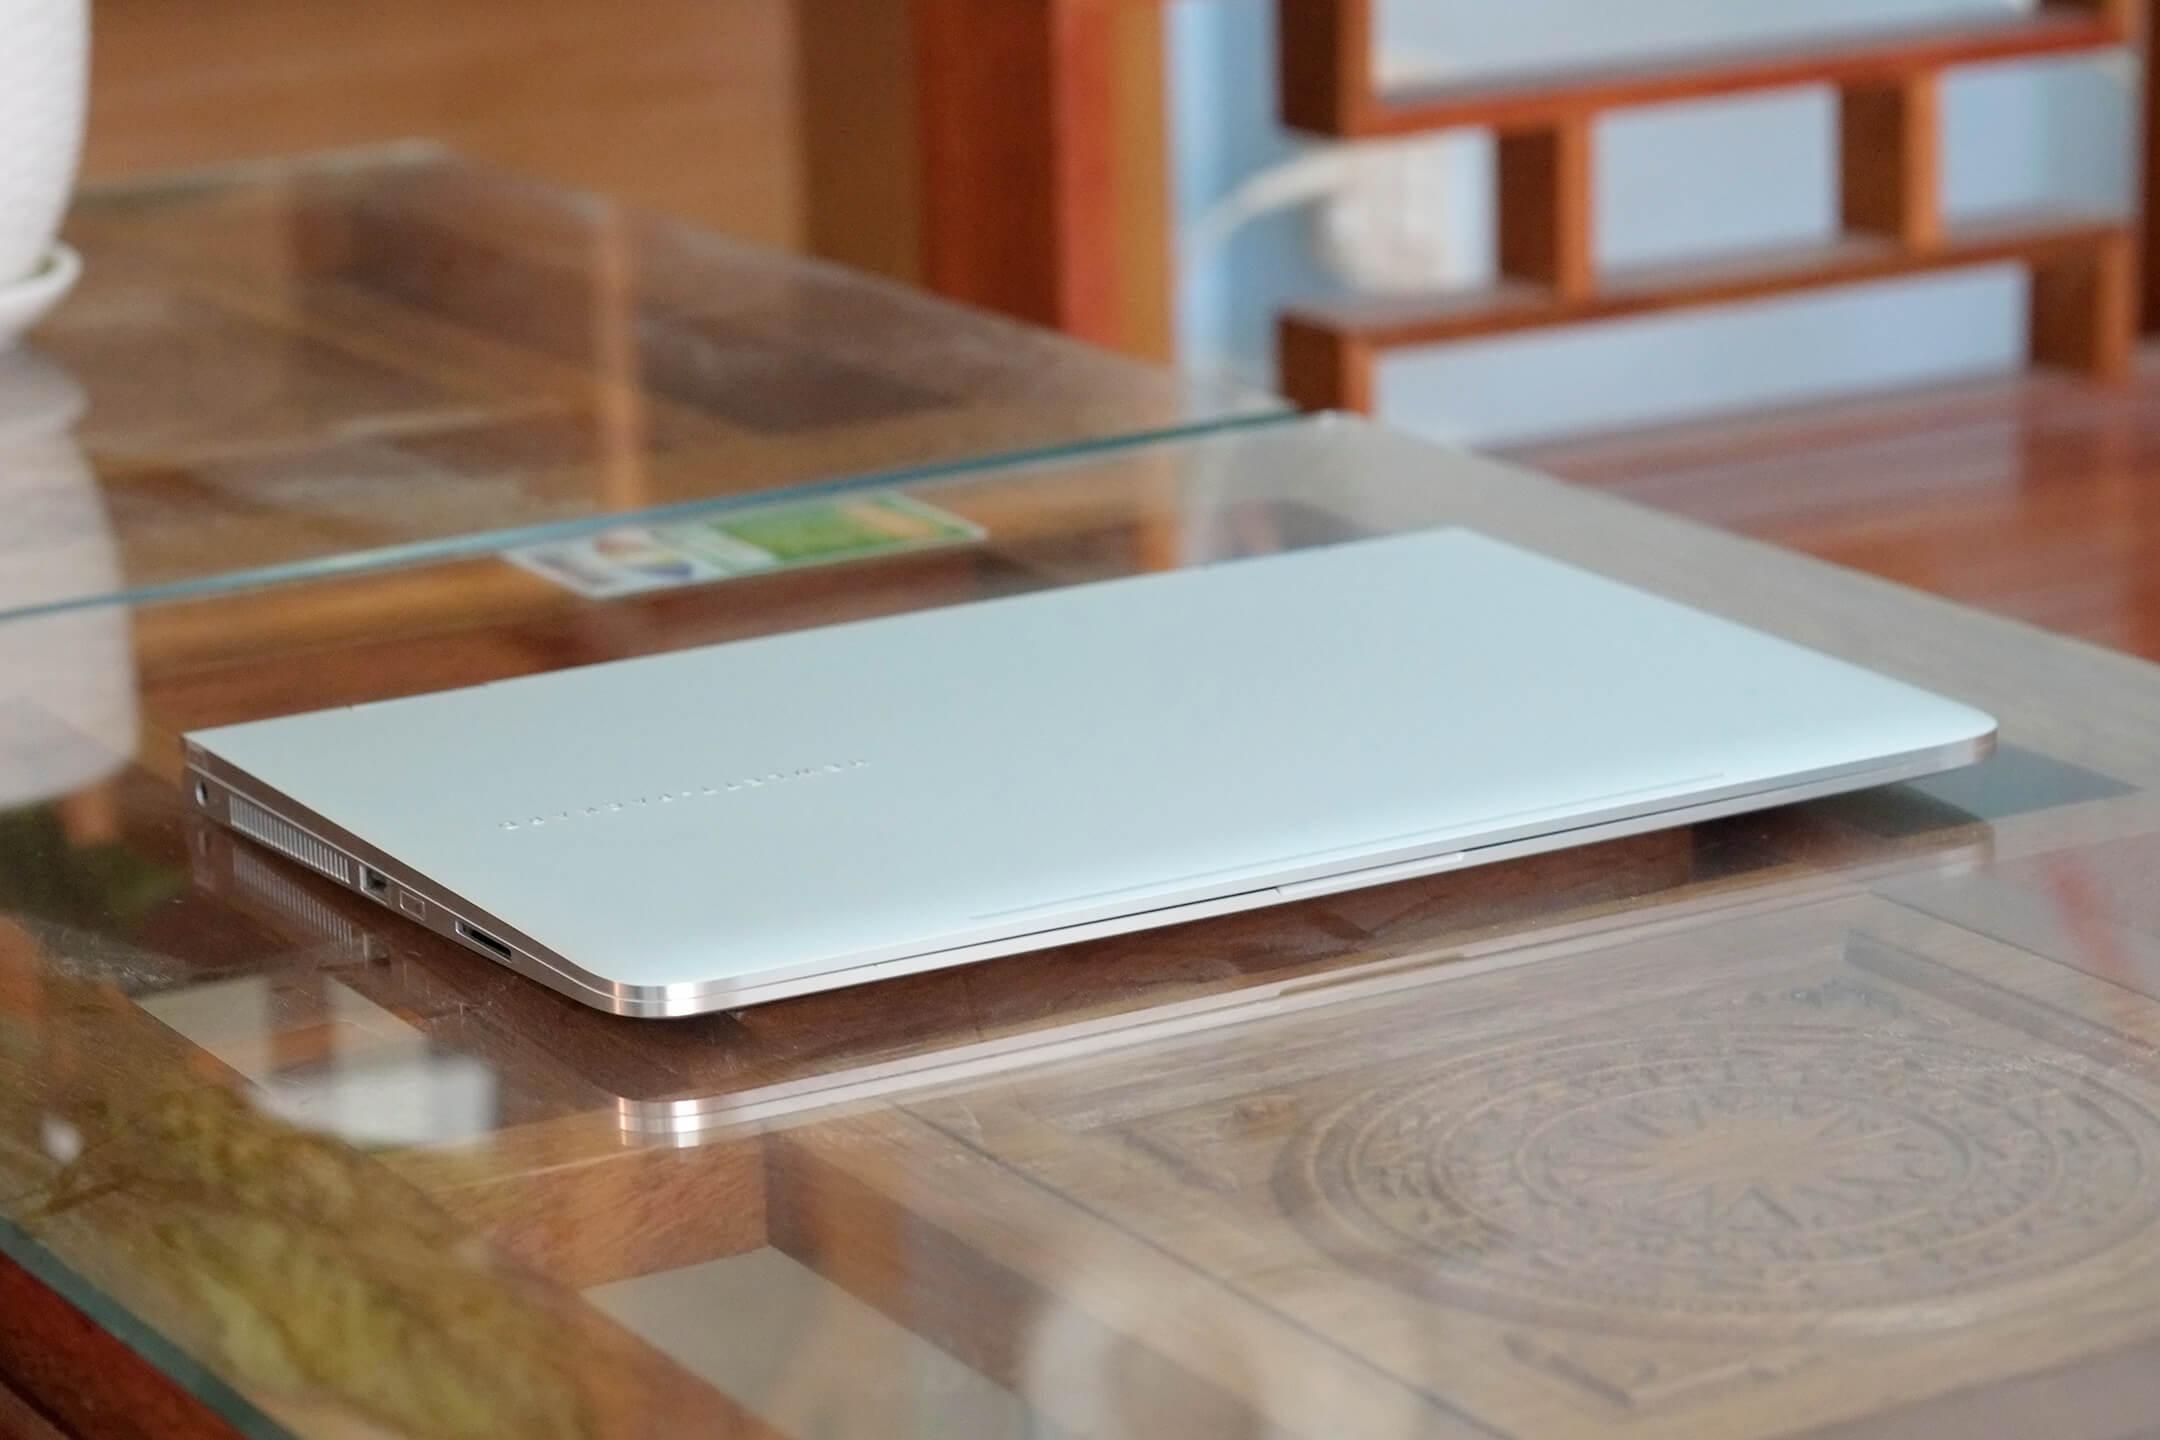 HP Spectre X360 i5 6200u / 8GB / 256GB / 13.3-inch FHD Touch / New 99%